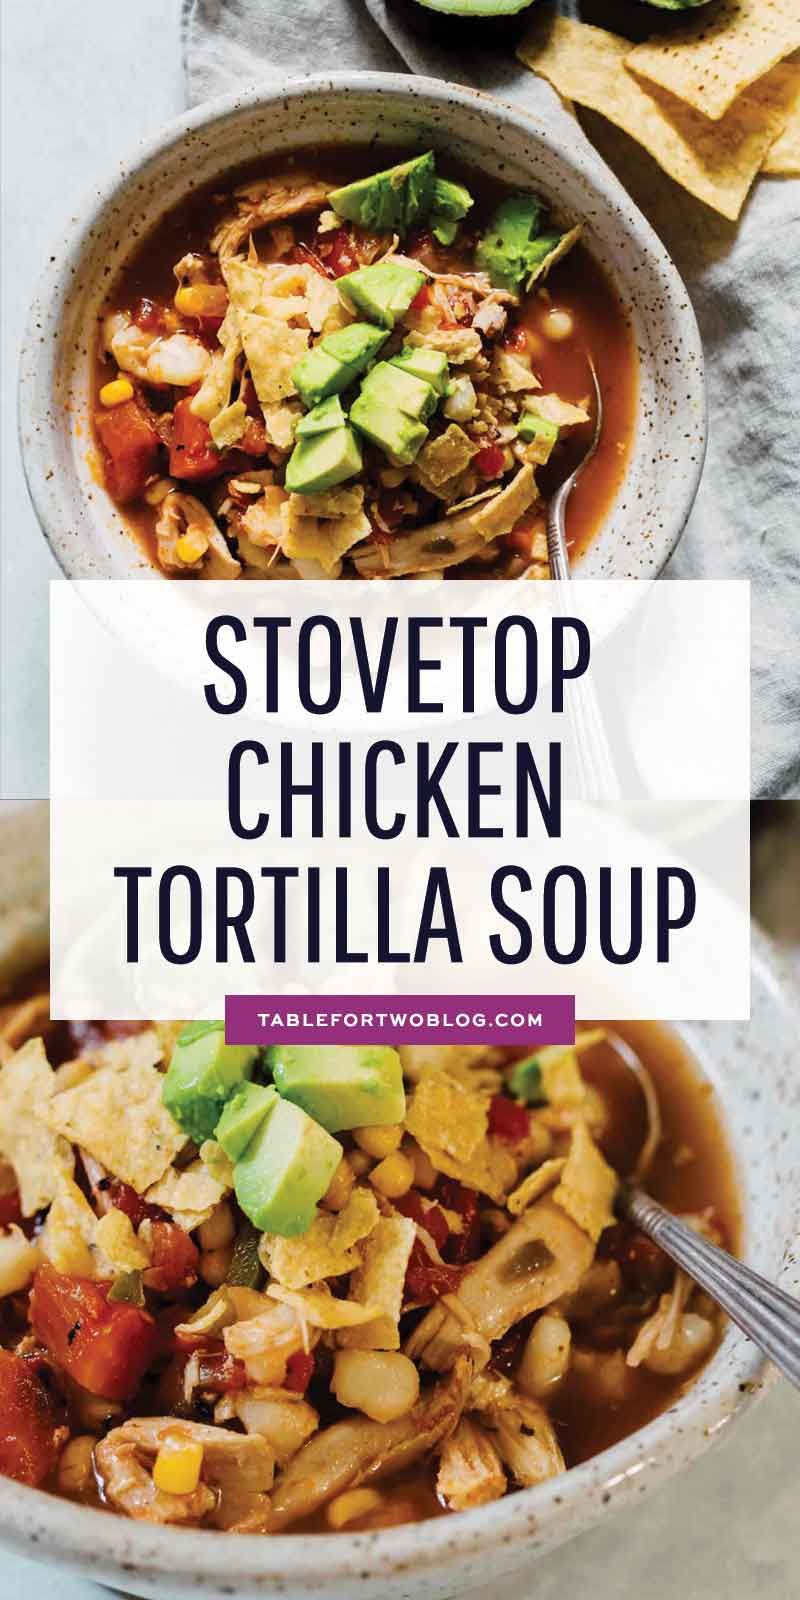 Stovetop Chicken Tortilla Soup - Flavorful Chicken Tortilla Soup Recipe